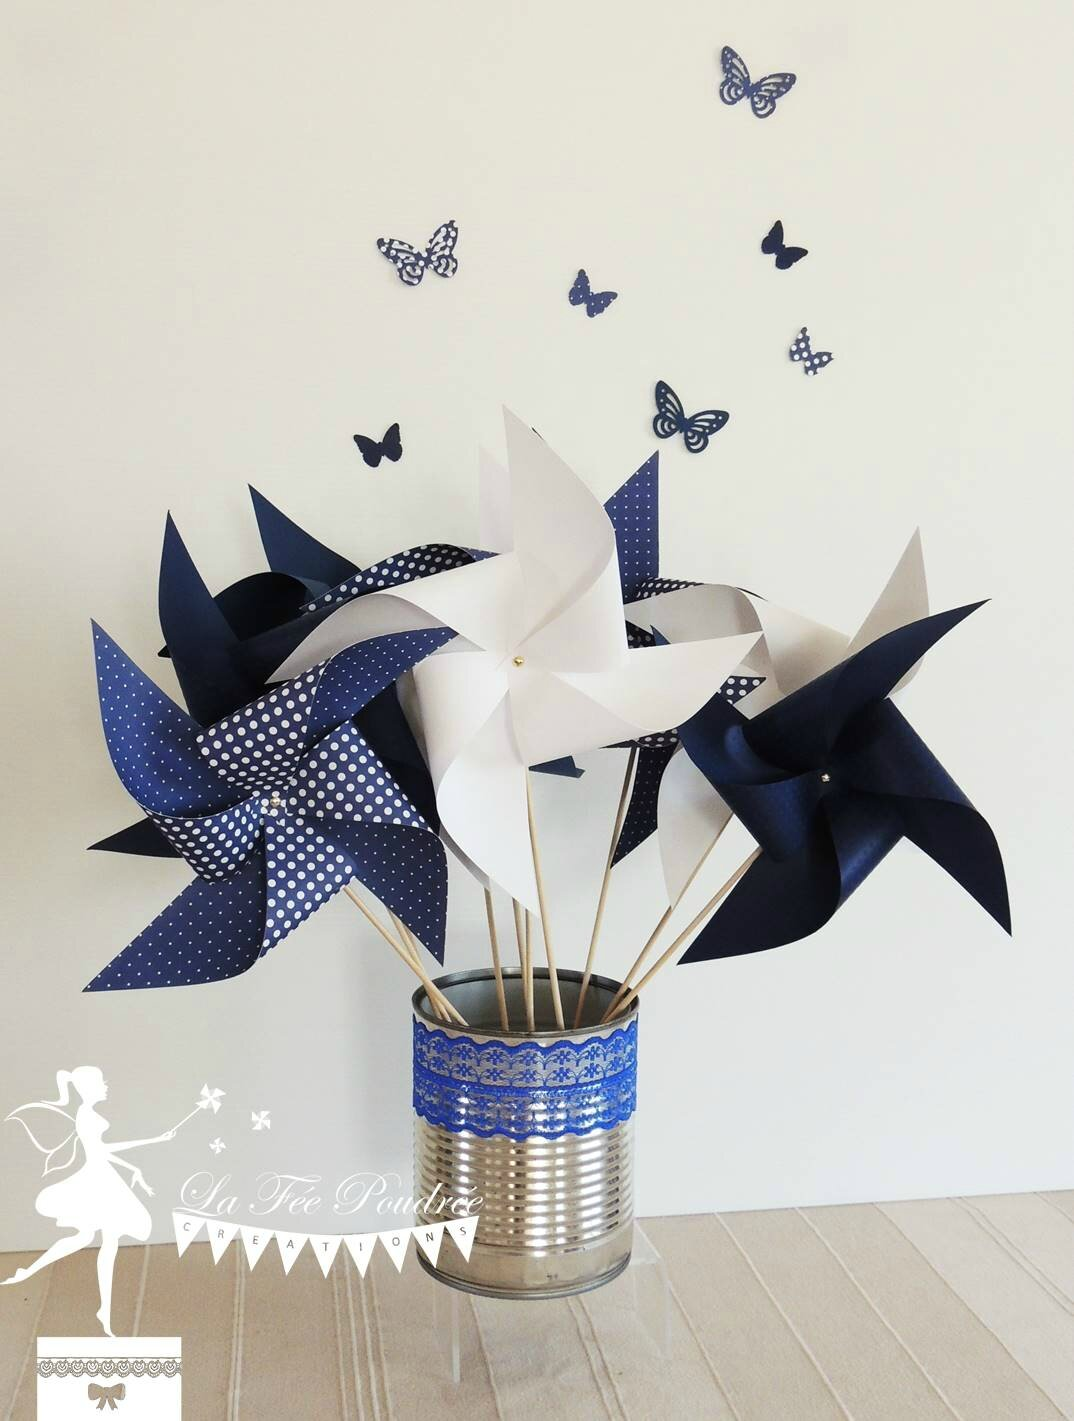 moulin a vent bleu marine pois blanc pompon decoration bapteme baby shoawer mariage ruban dentelle theme papillon